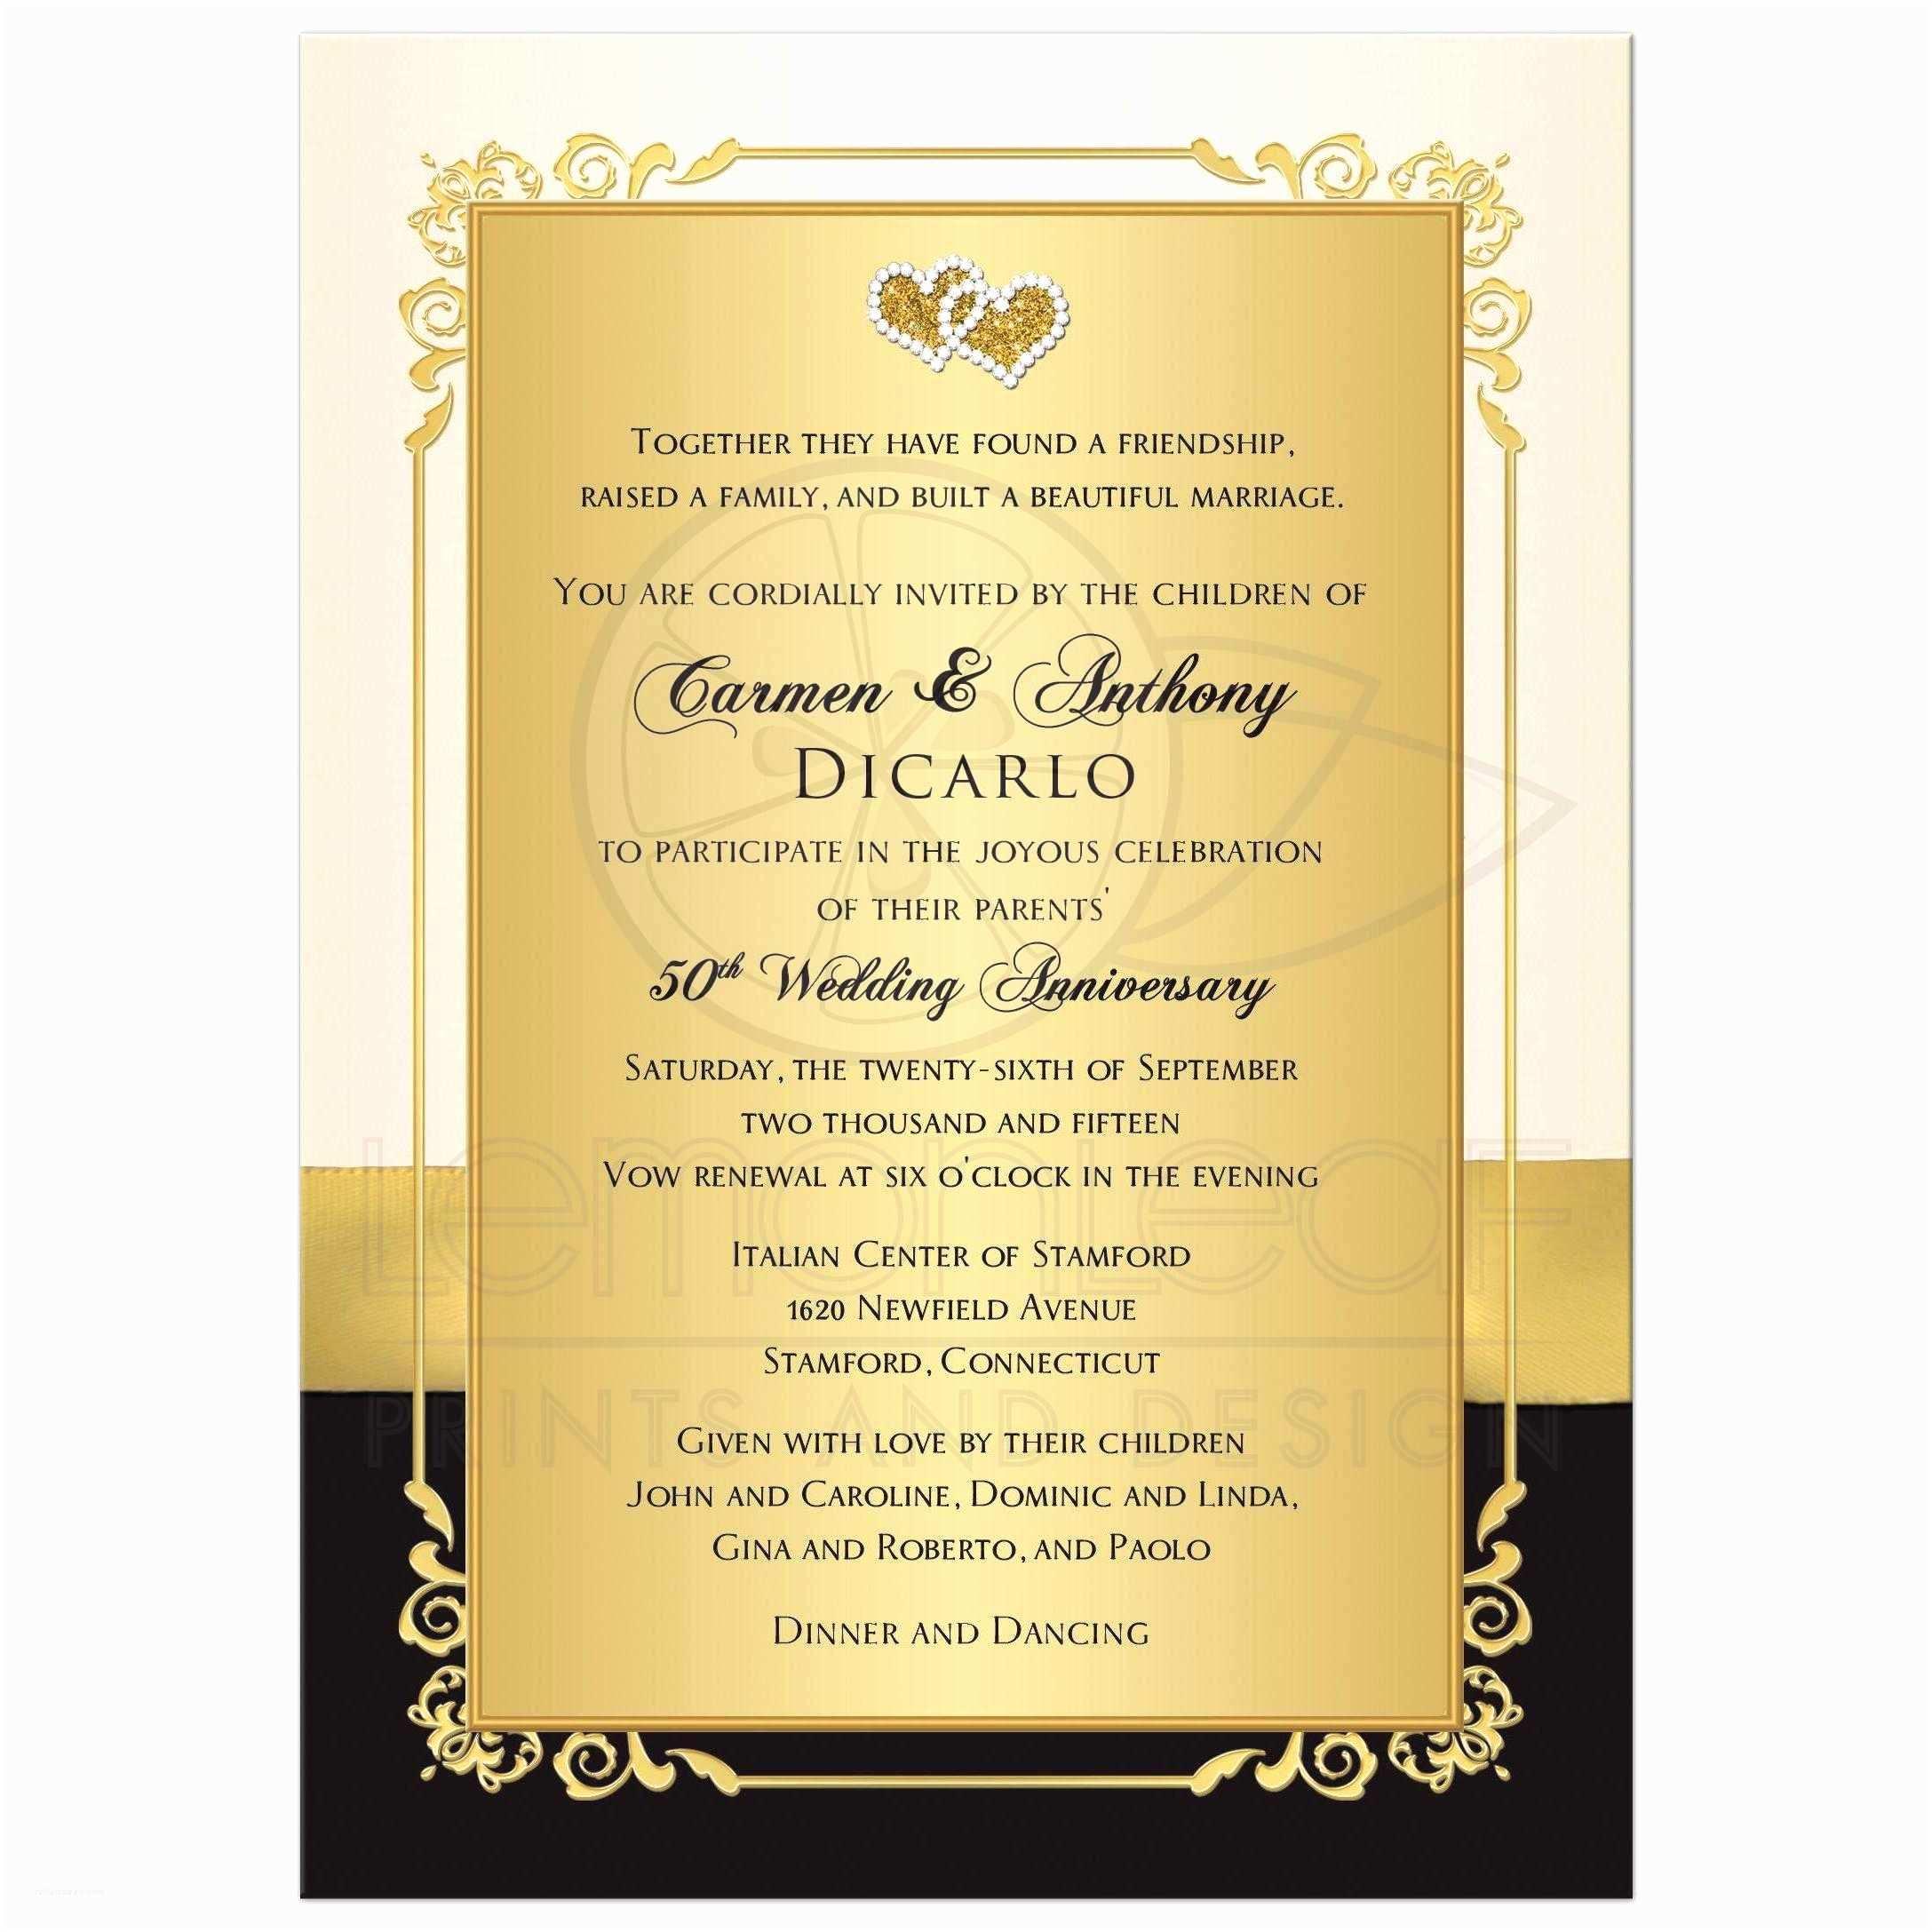 Anniversary Party Invitations Golden  Anniversary Invitation Golden